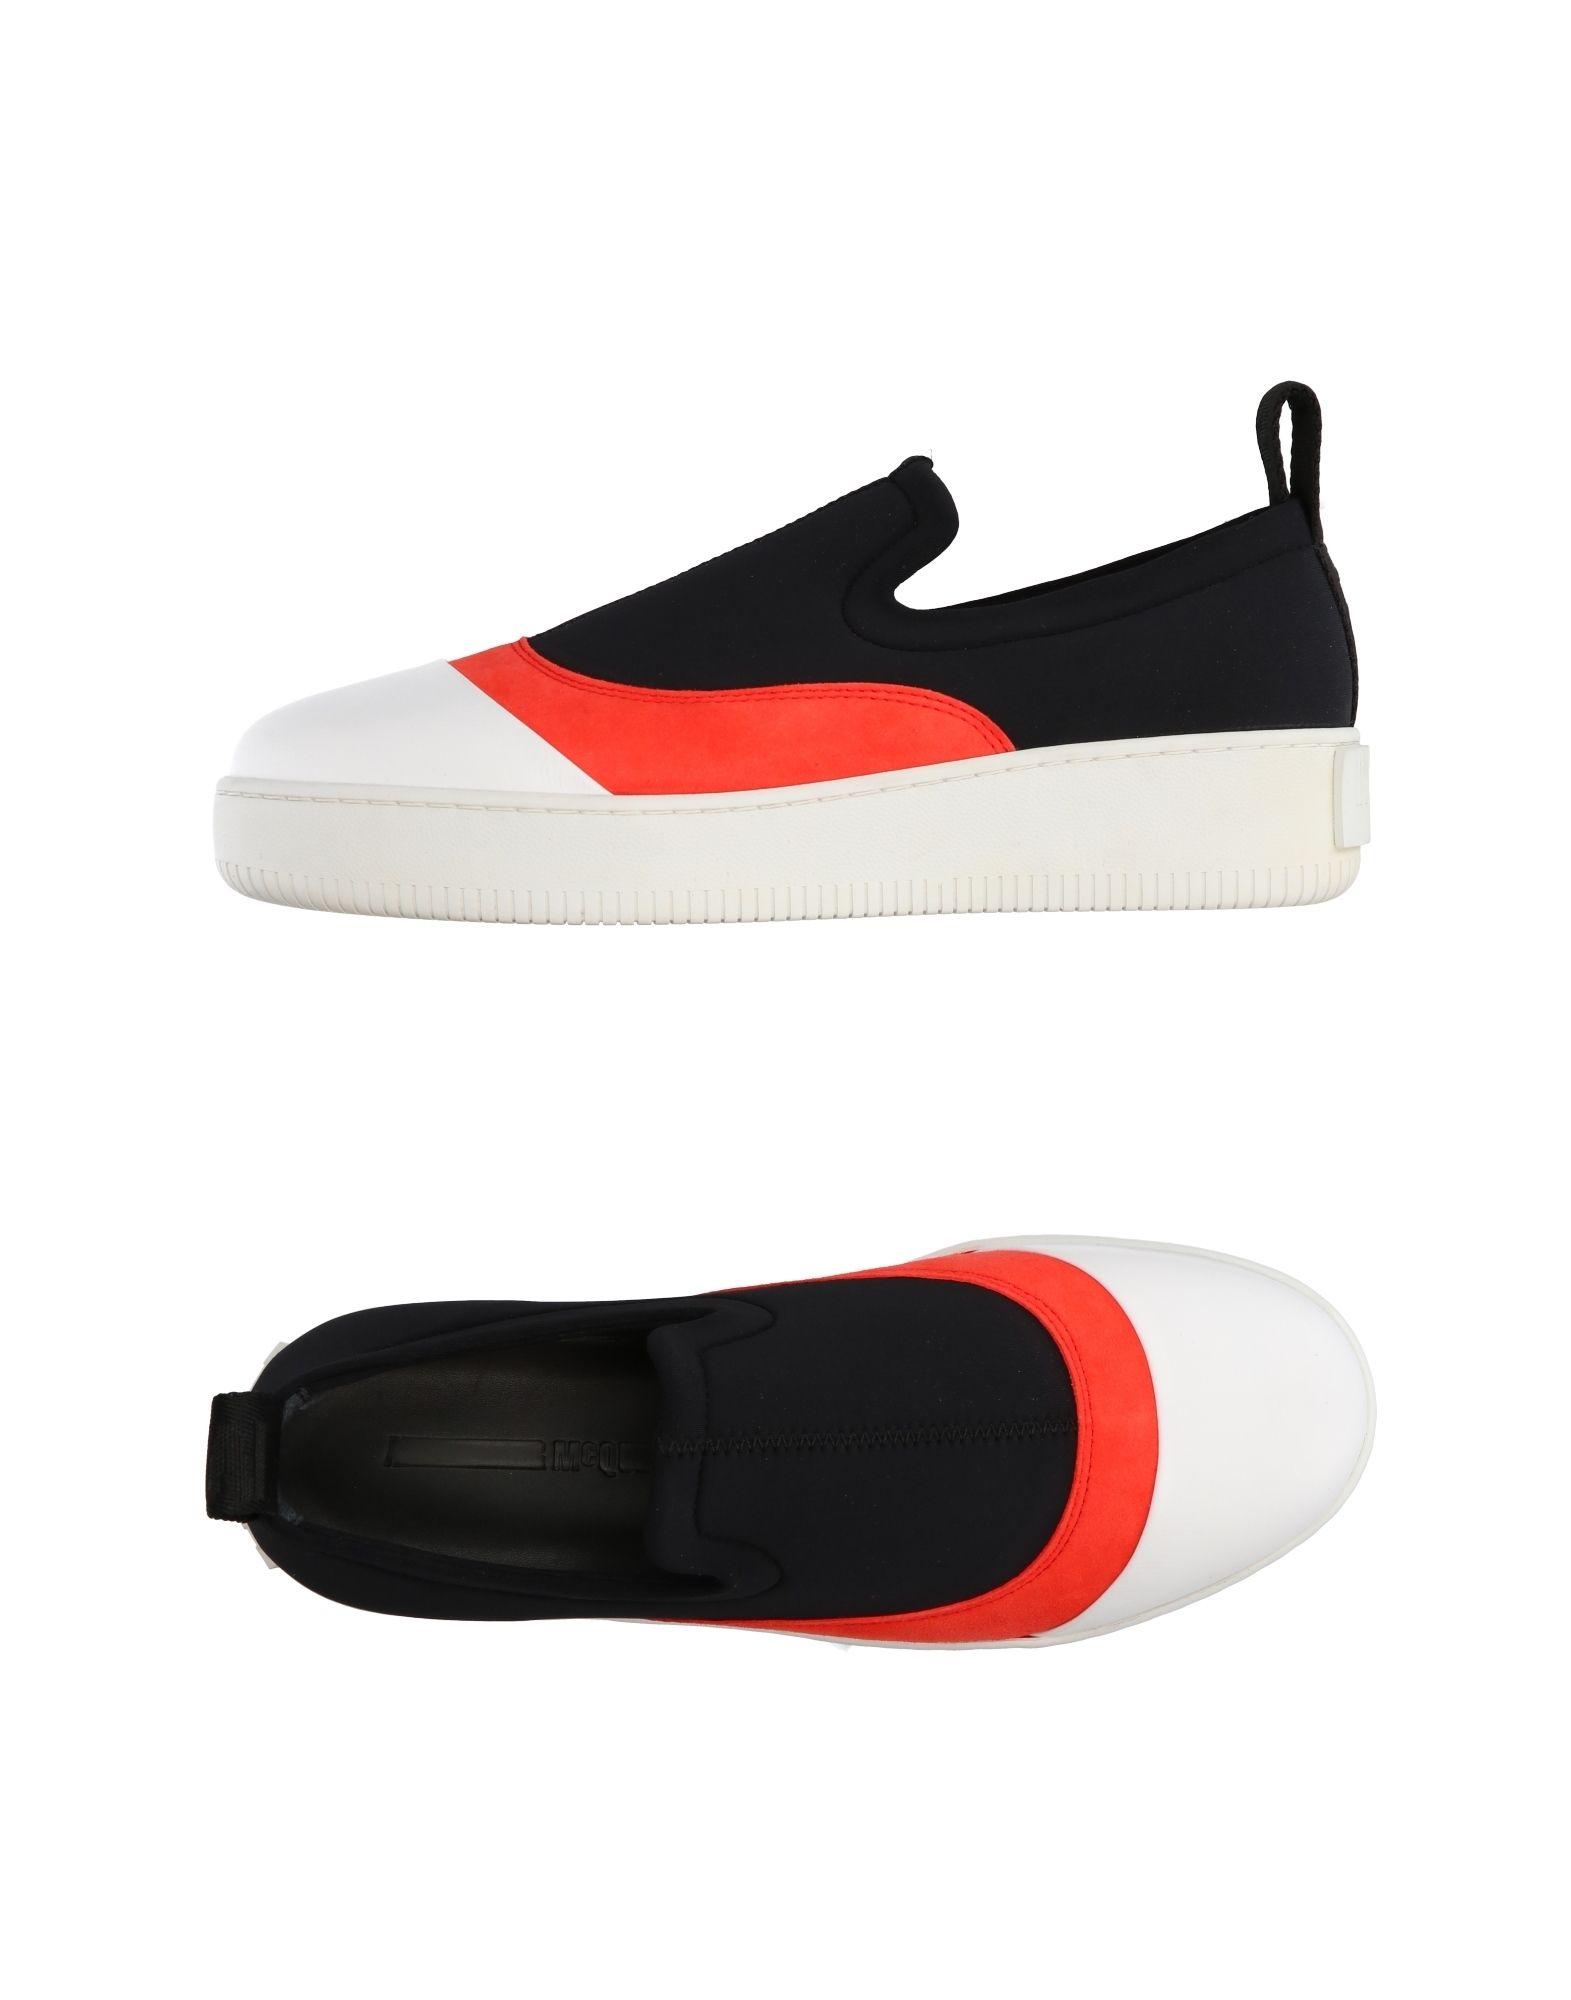 Stilvolle billige Schuhe Mcq Alexander Mcqueen Sneakers Damen  11286750LF